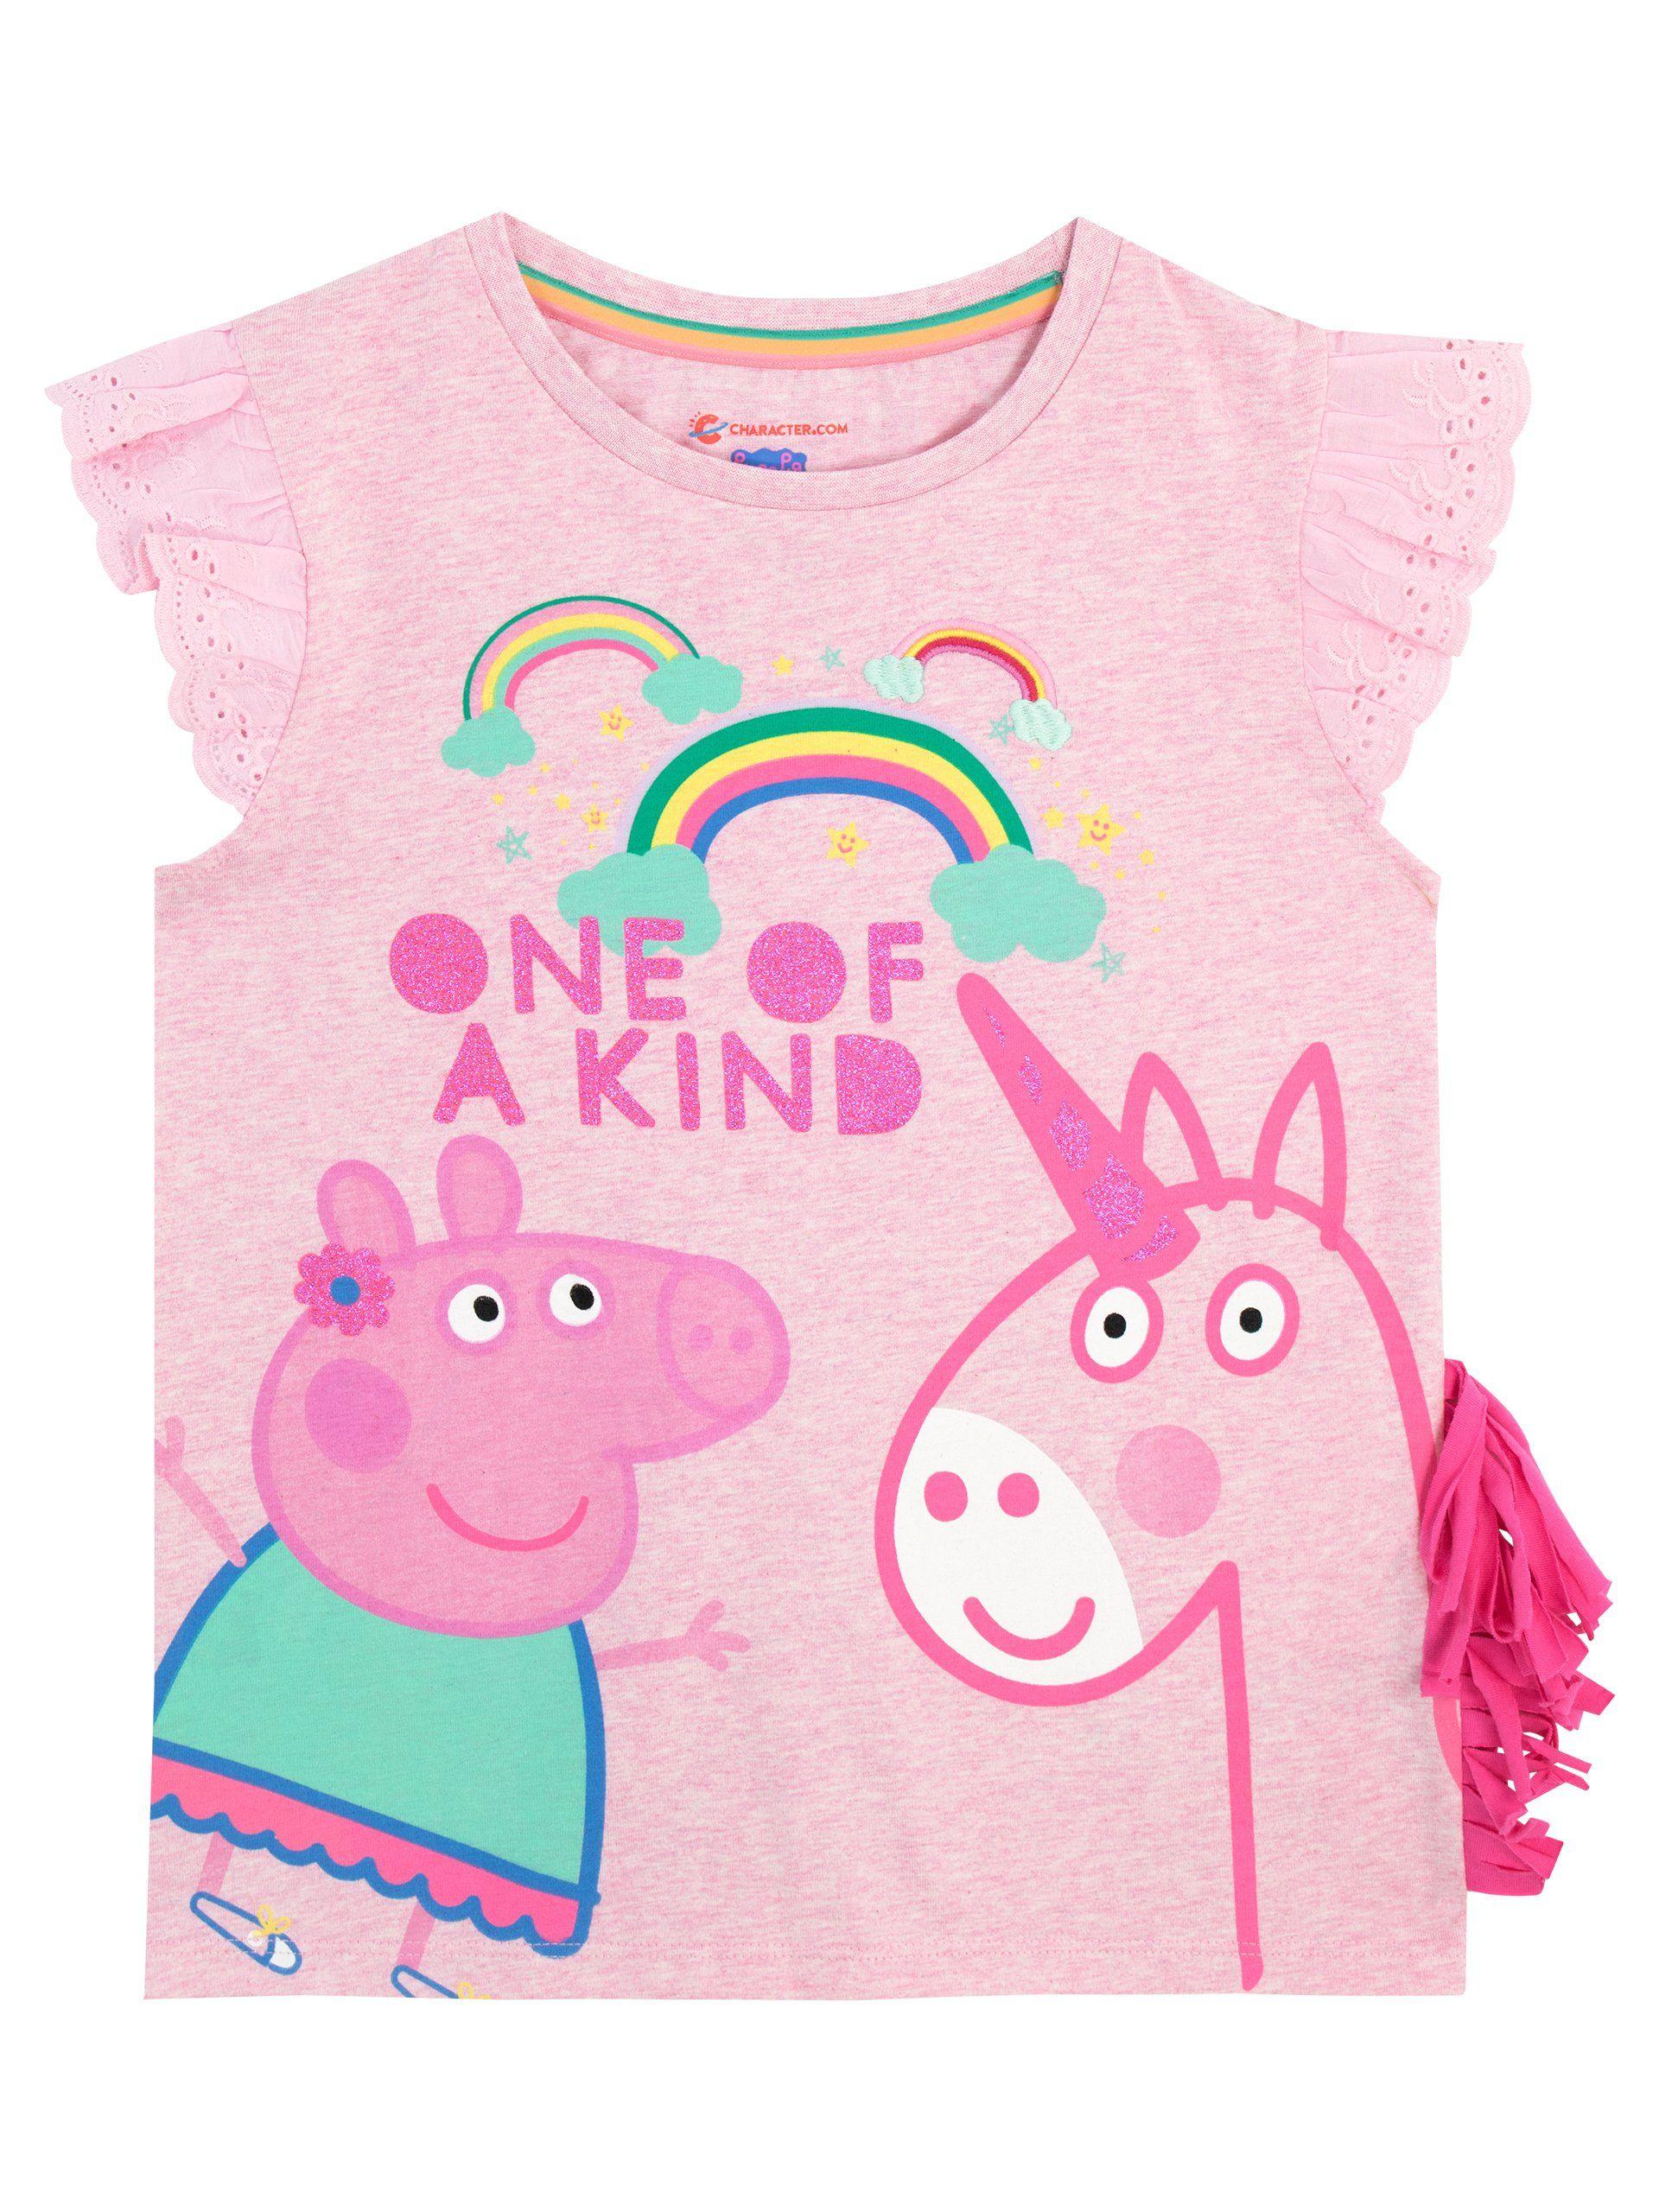 Kleding en accessoires Peppa Pig Dress I Peppa Pig Outfit I Peppa Pig Unicorn Dress